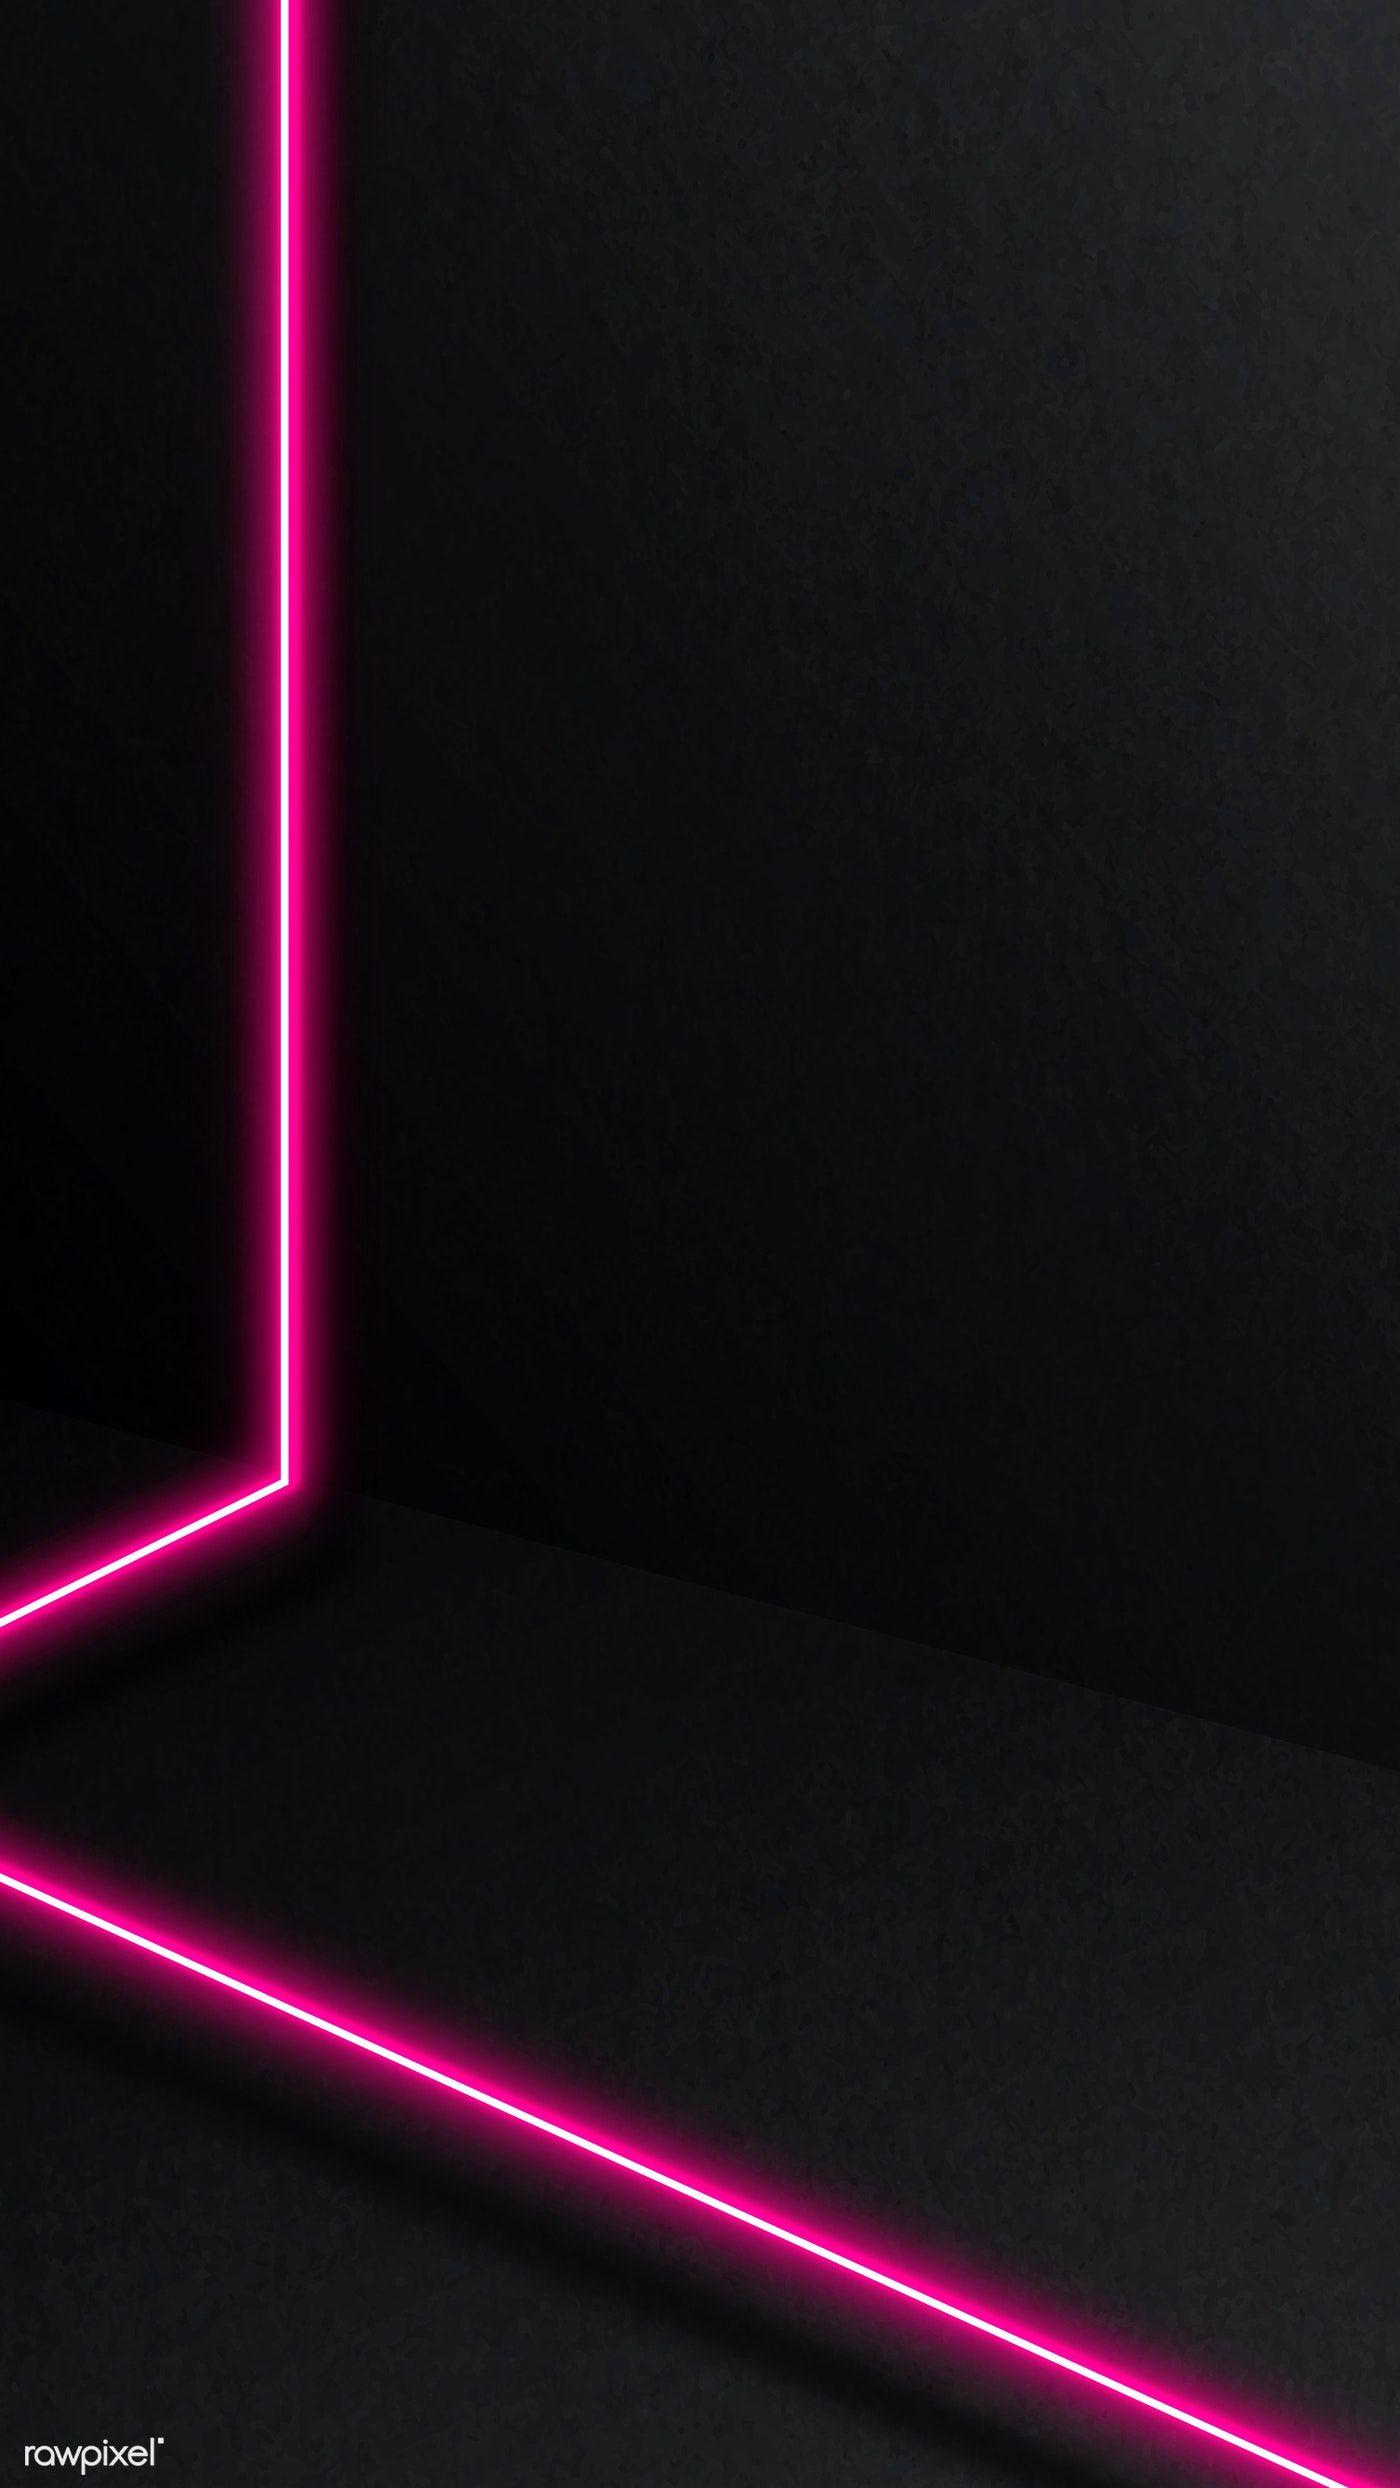 Download Premium Vector Of Pink Glowing Lines On Dark Background Vector Pink And Black Wallpaper Dark Backgrounds Black Wallpaper Iphone